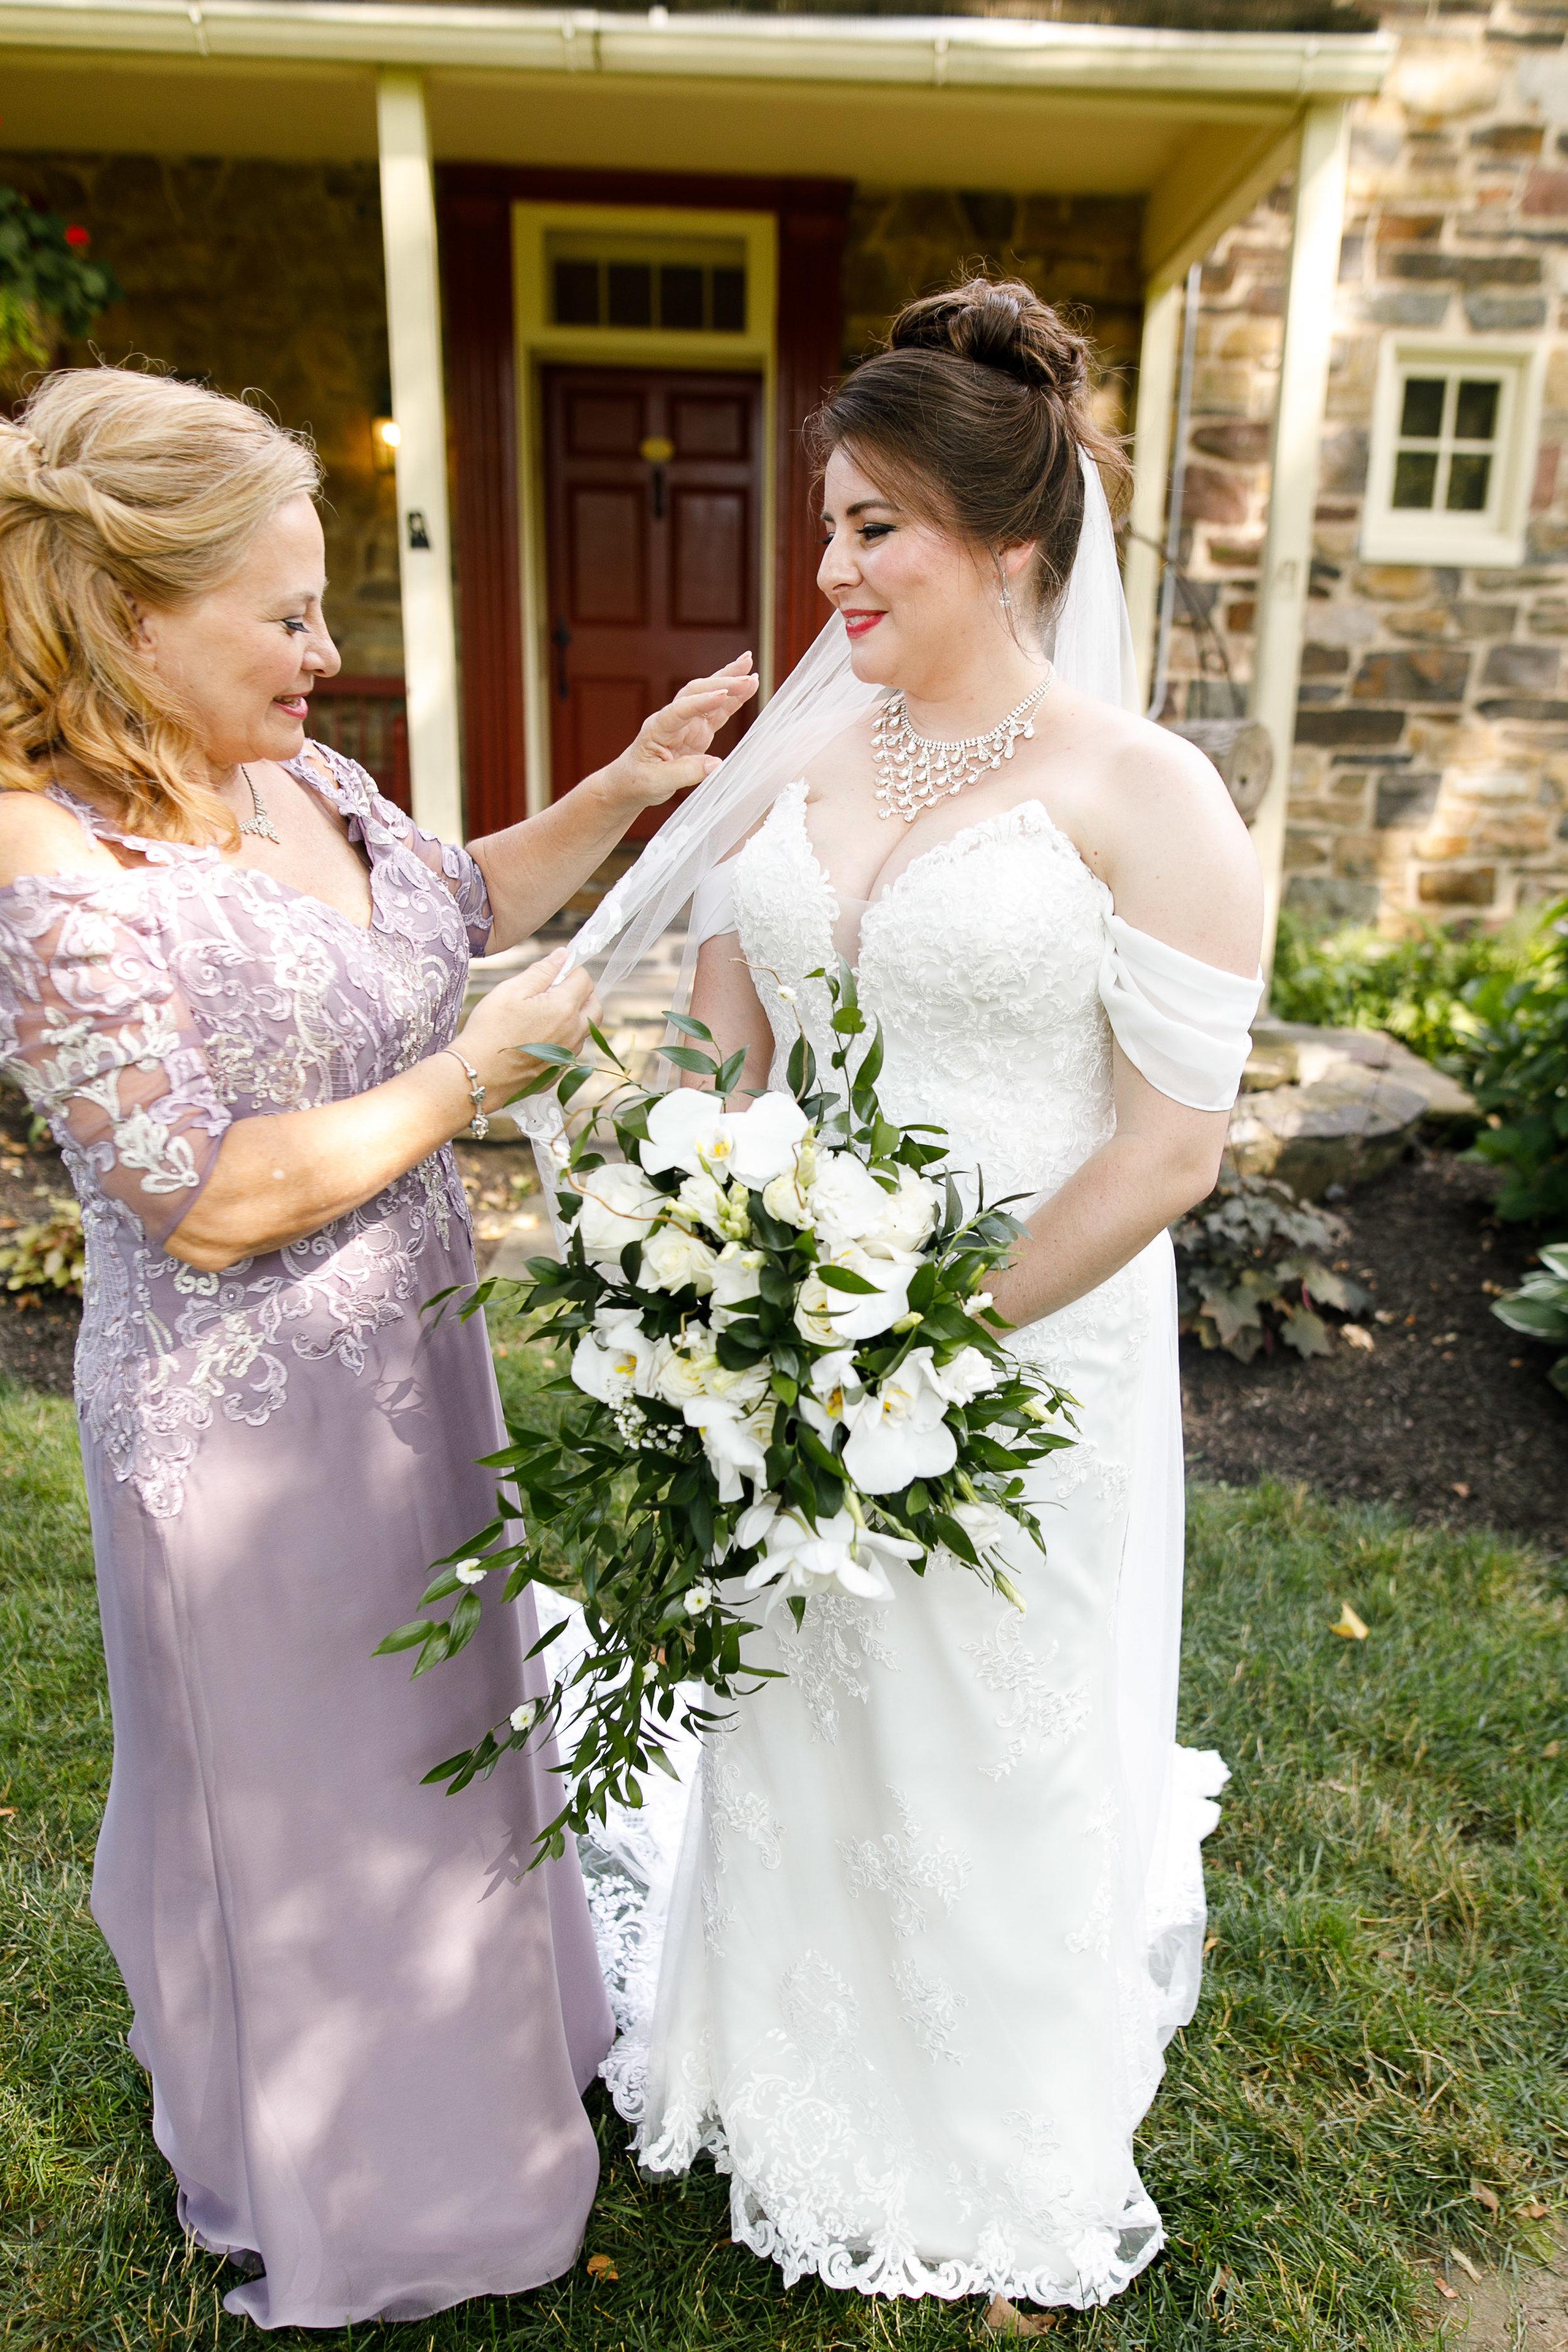 Wedding at Joseph Ambler In Bucks County PA21.jpg